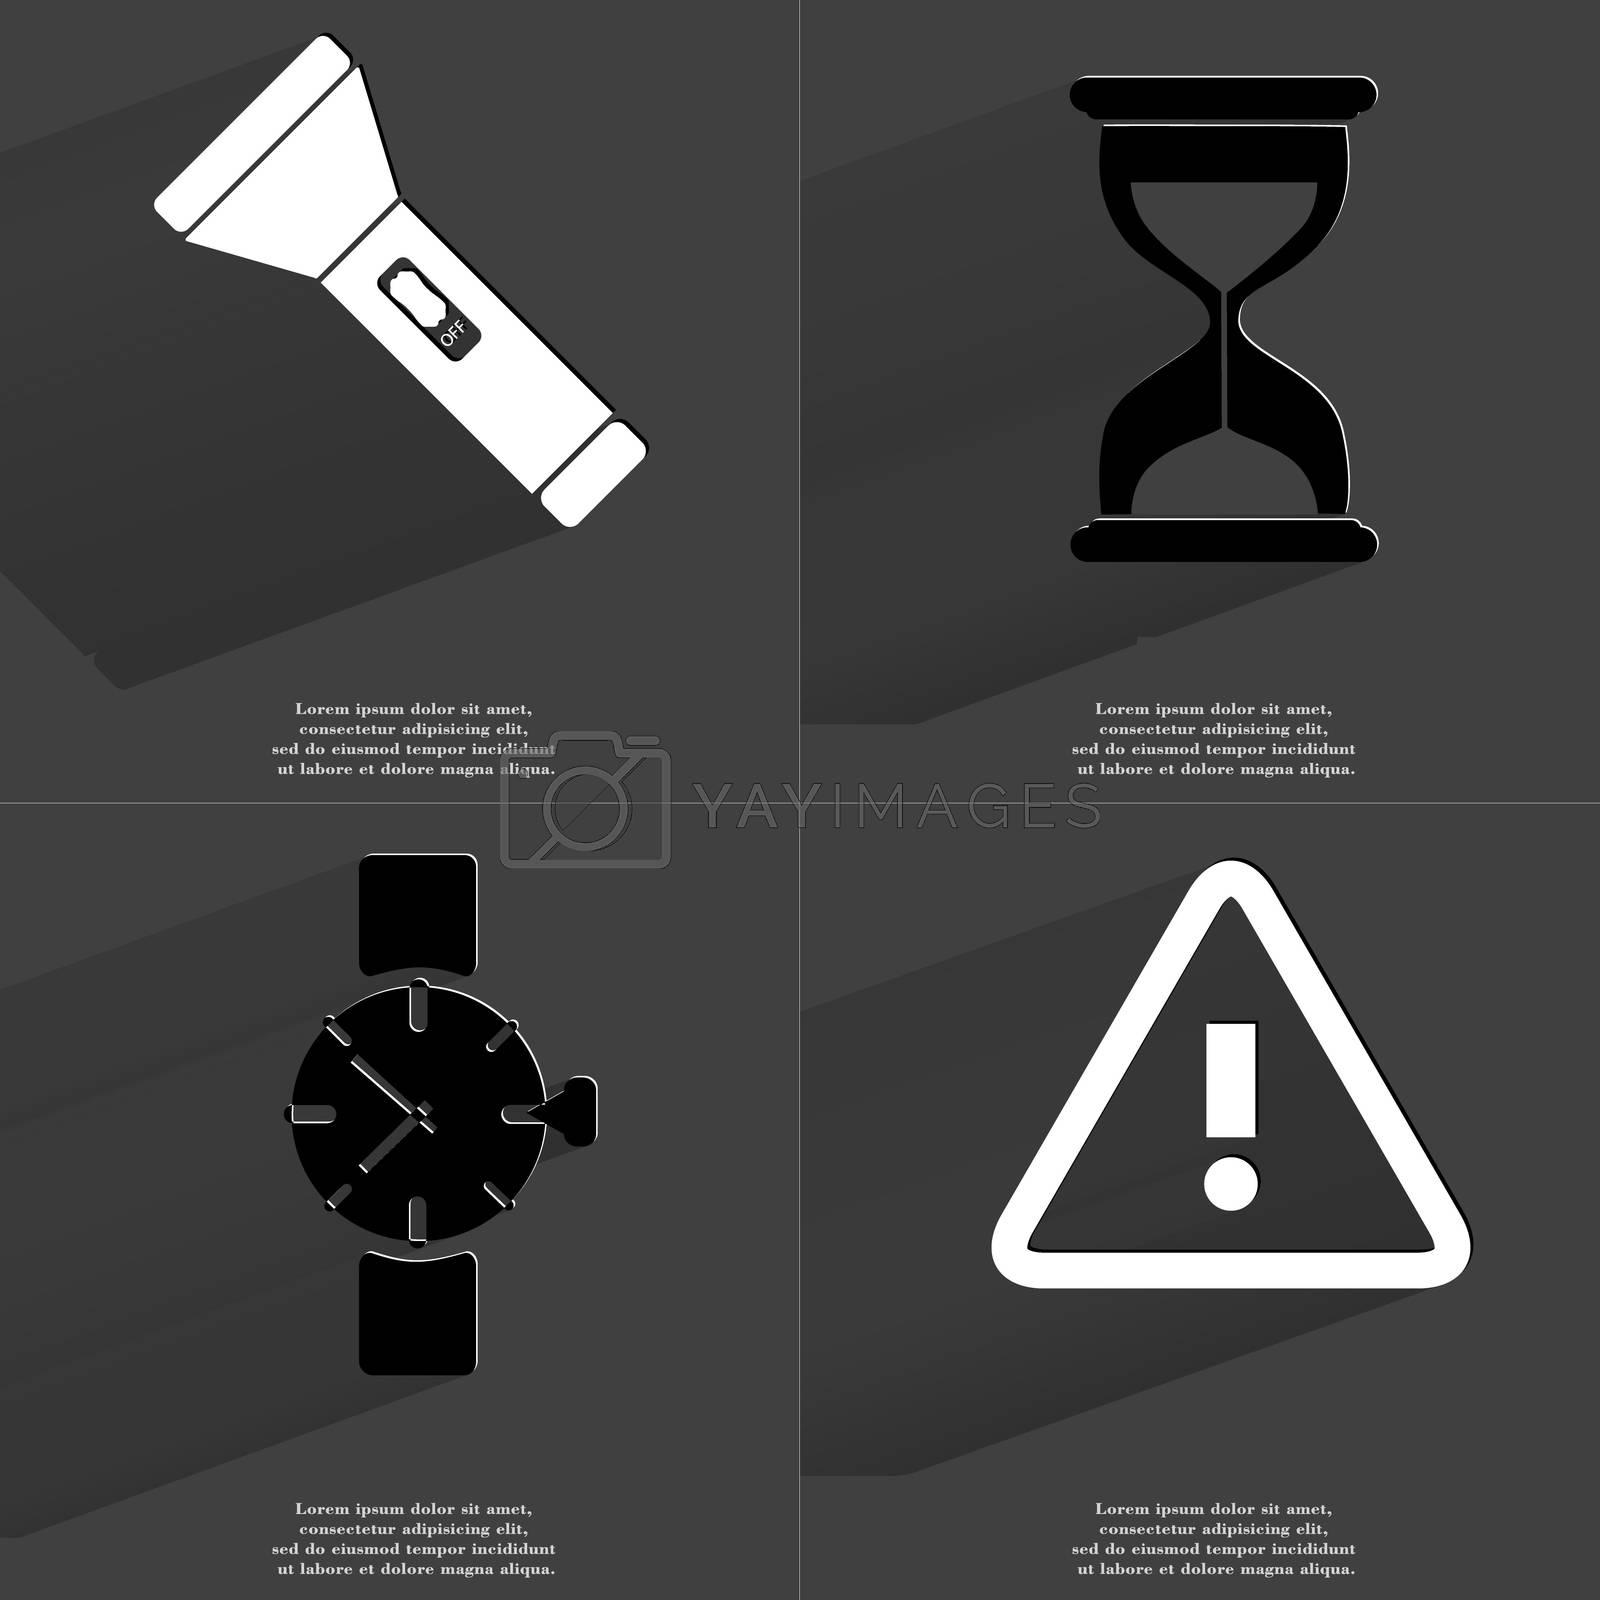 Royalty free image of Flashlight, Hourglass, Wrist watch, Warning sign. Symbols with long shadow. Flat design by serhii_lohvyniuk